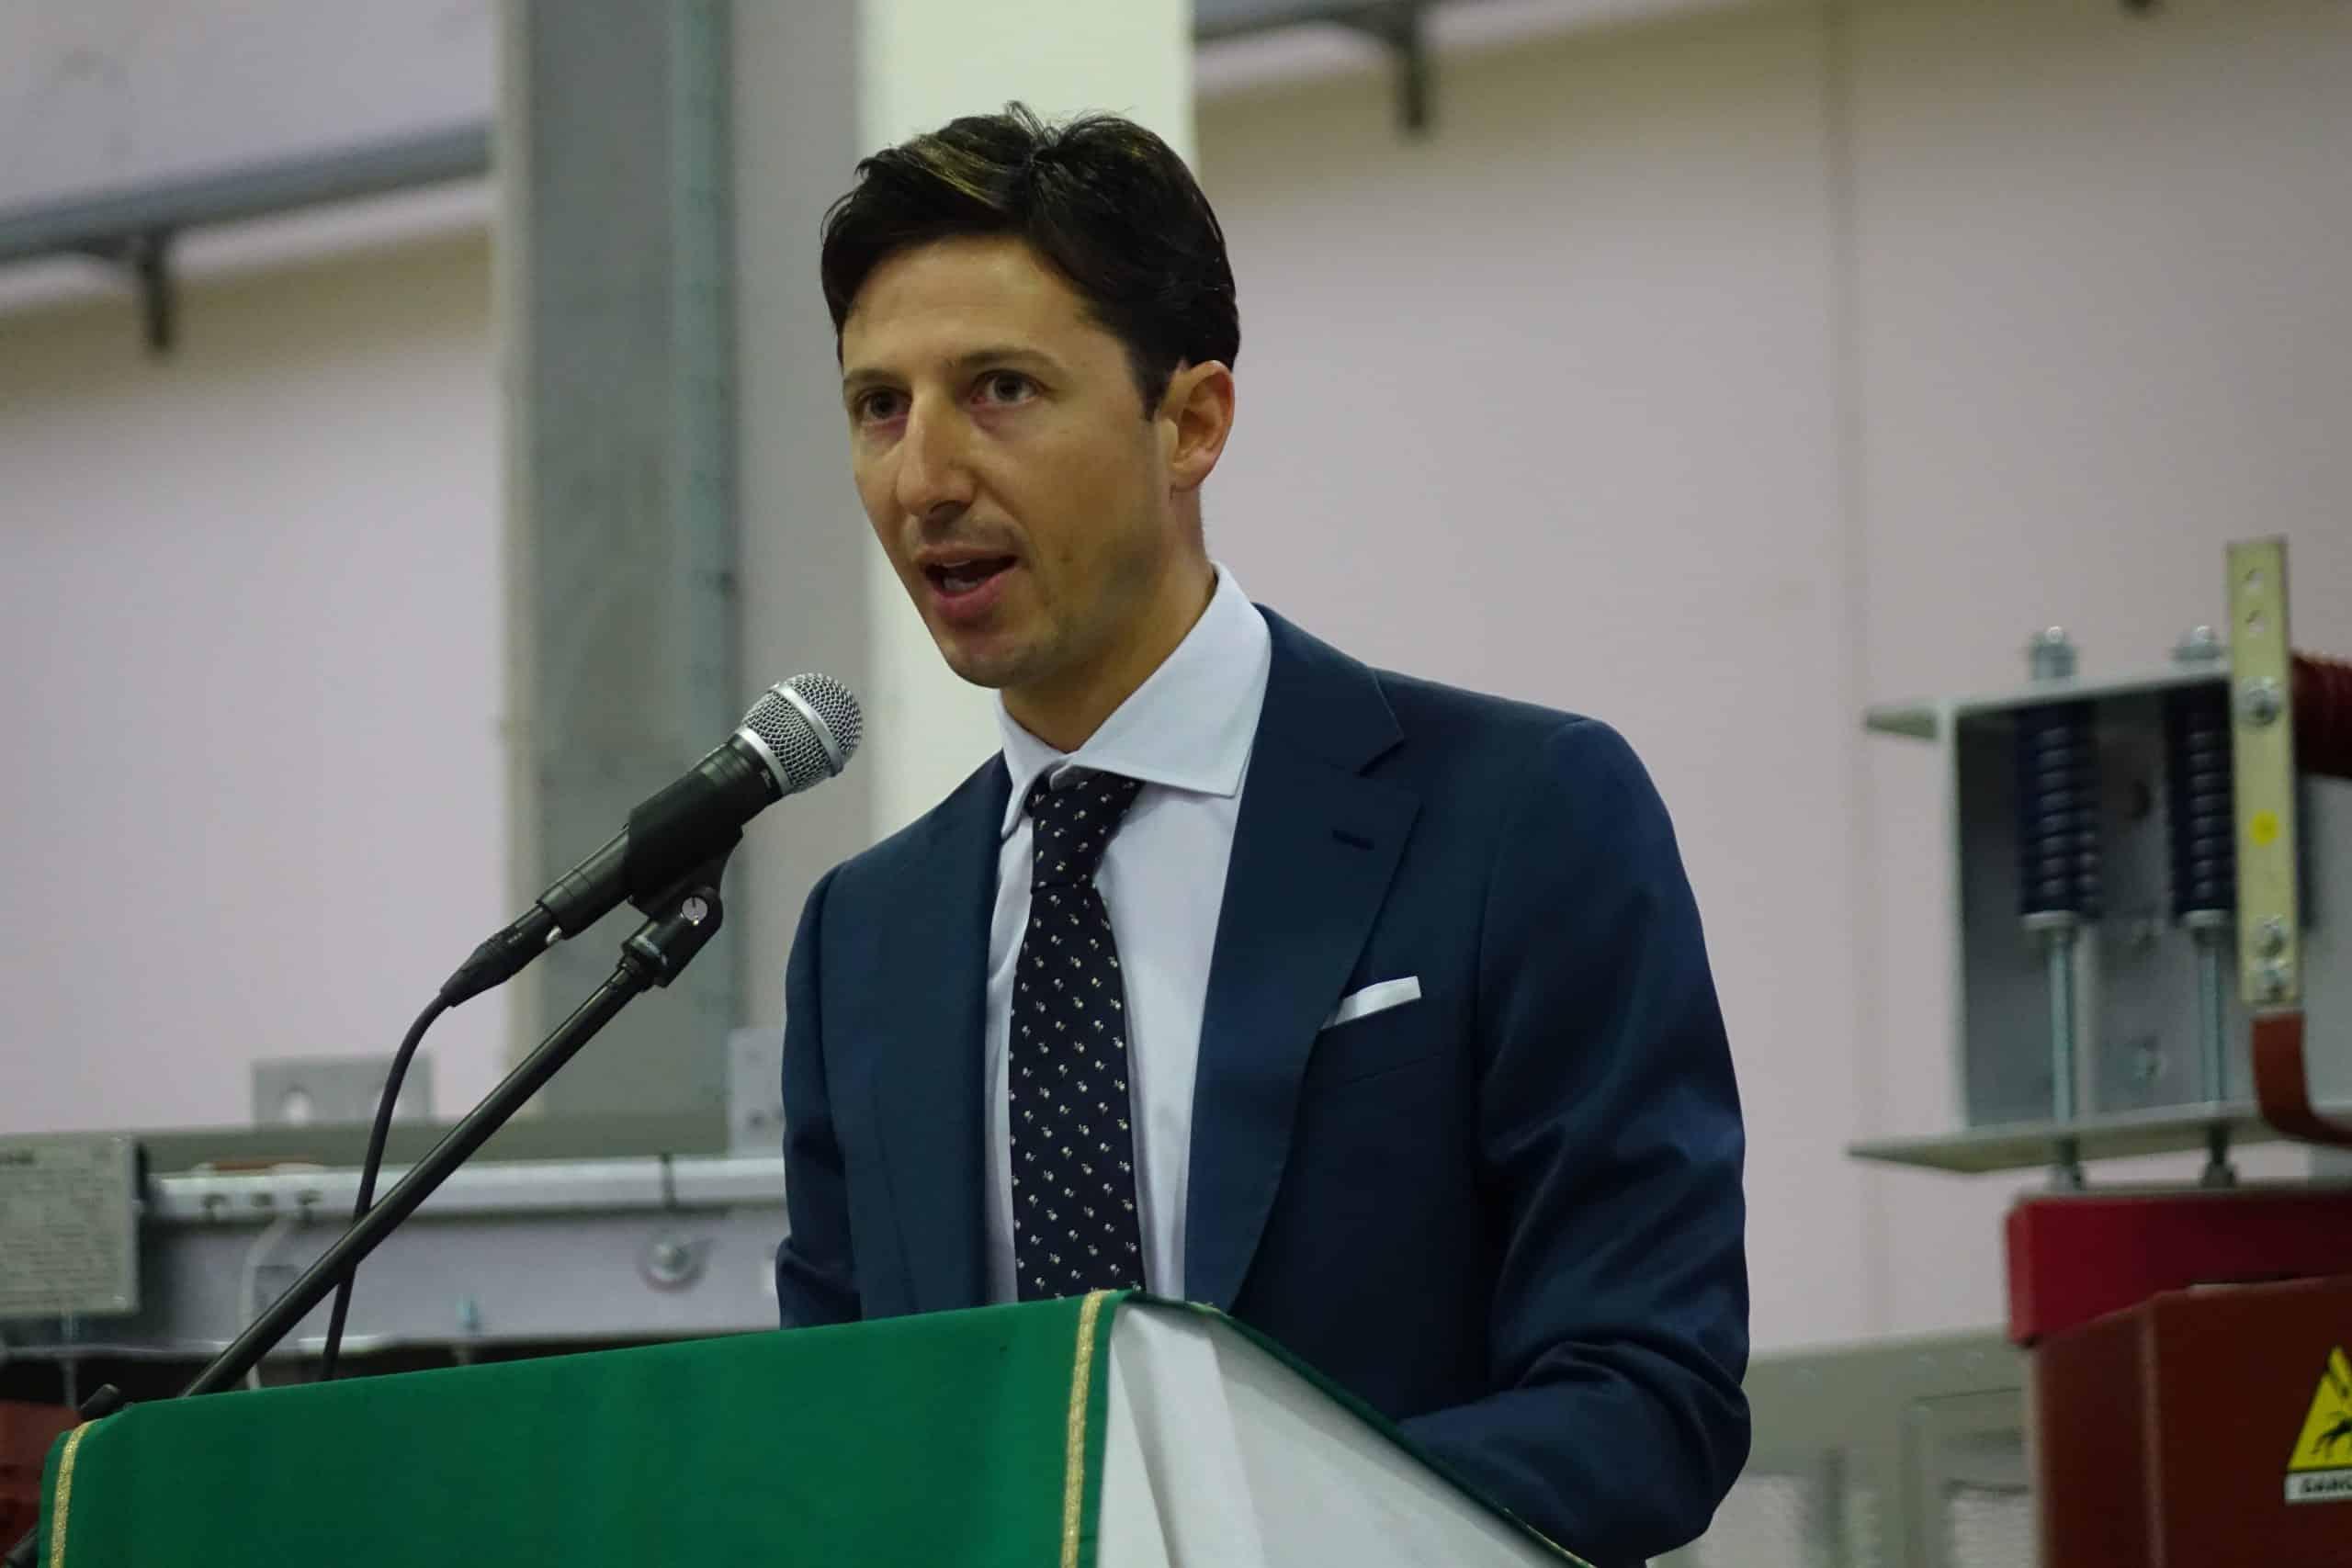 Matteo Angiolini speaks at Holy Mass Tesar